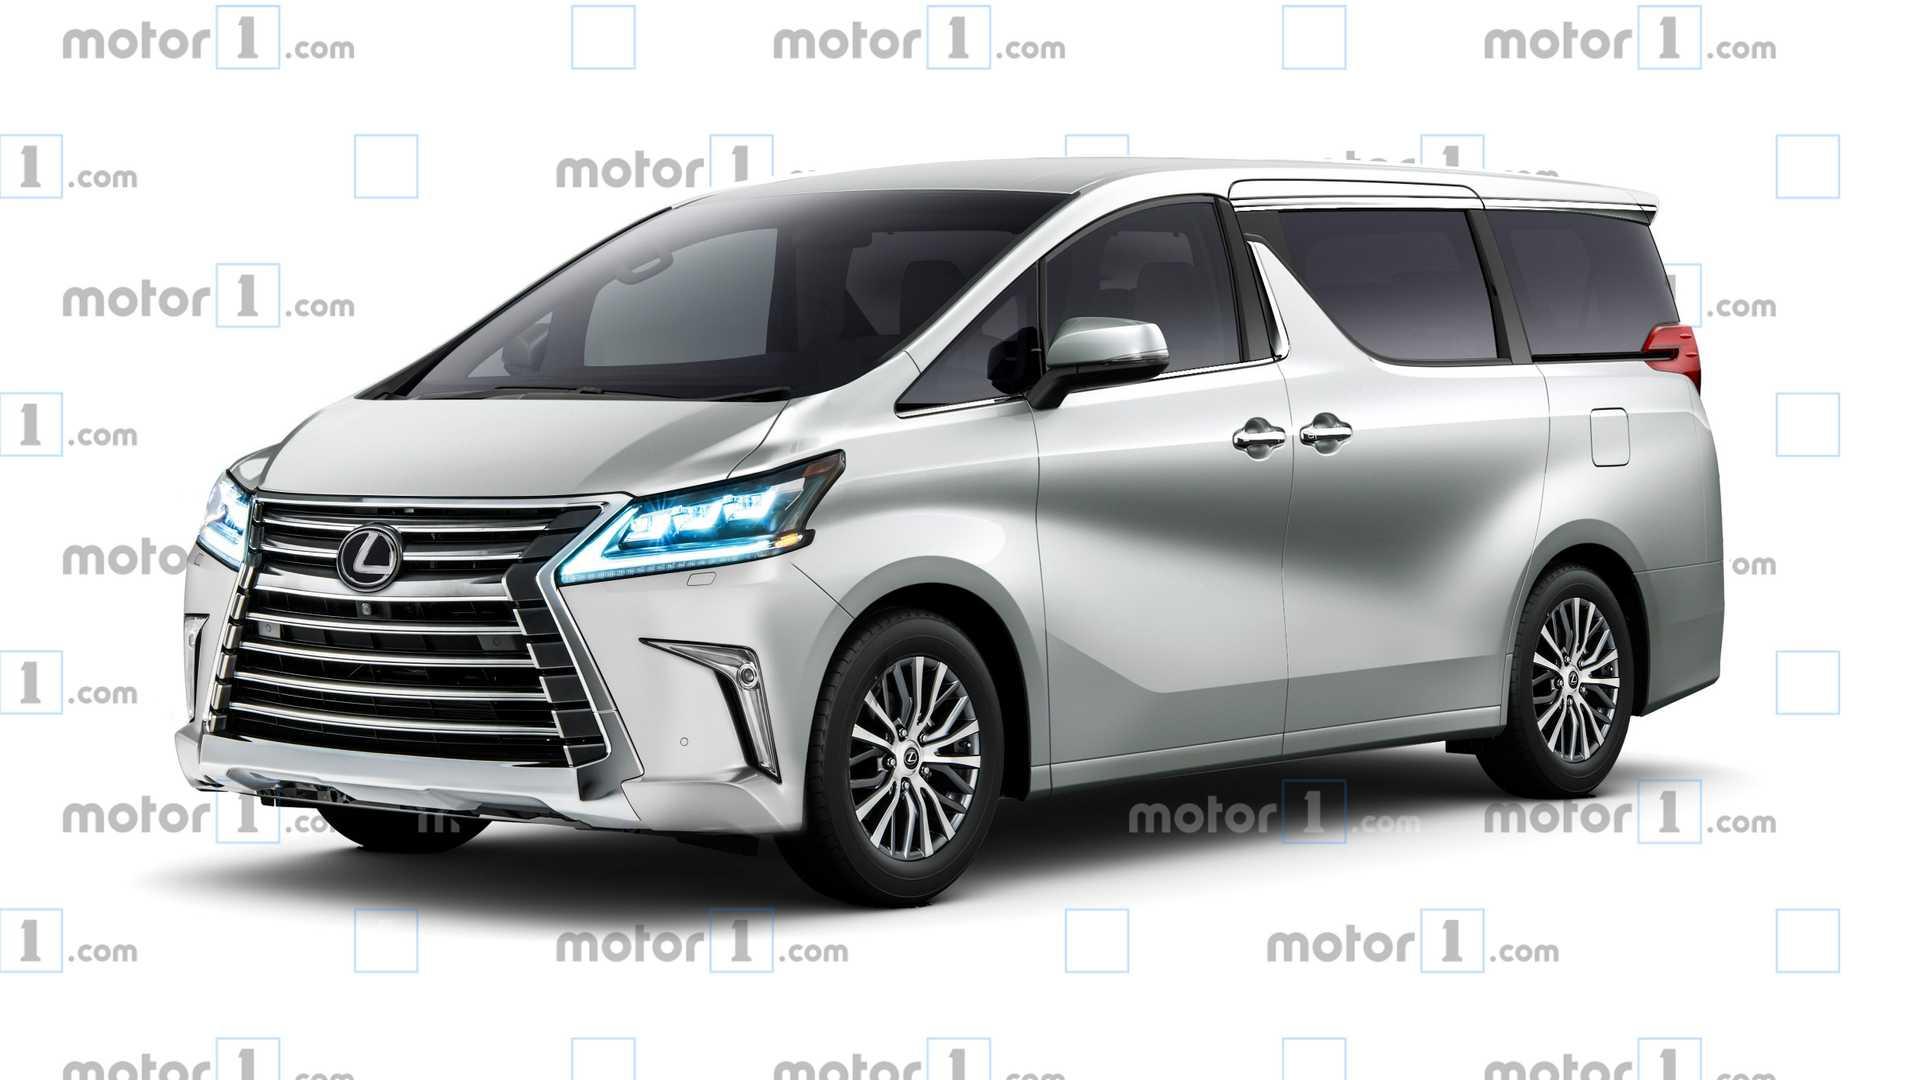 62 New Toyota Van 2020 History for Toyota Van 2020